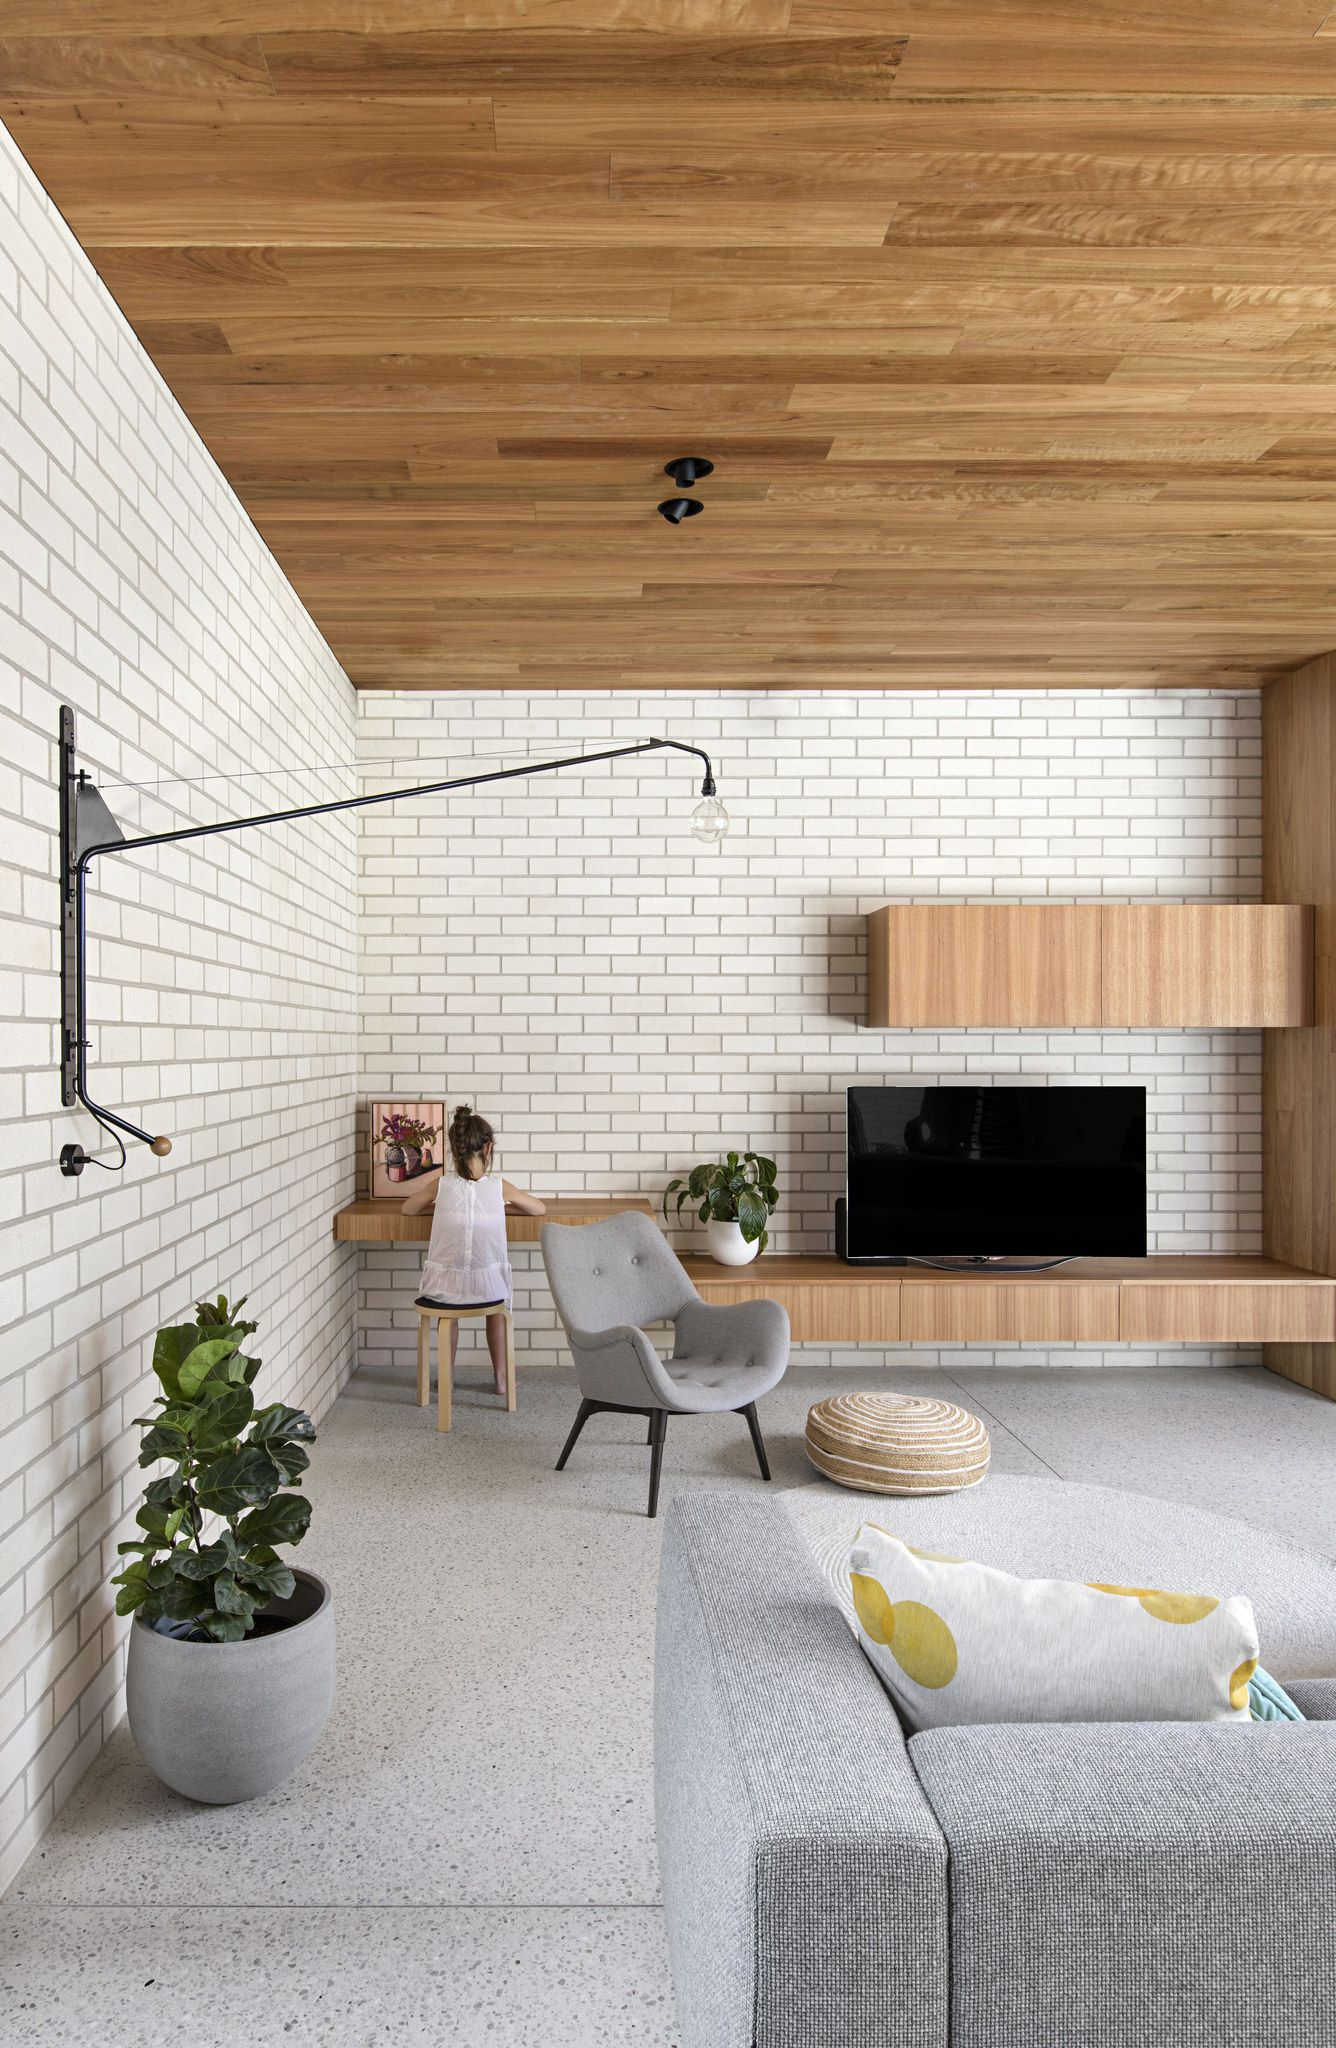 Bowral Bricks In Chillingham White Brick Interior Wall Brick